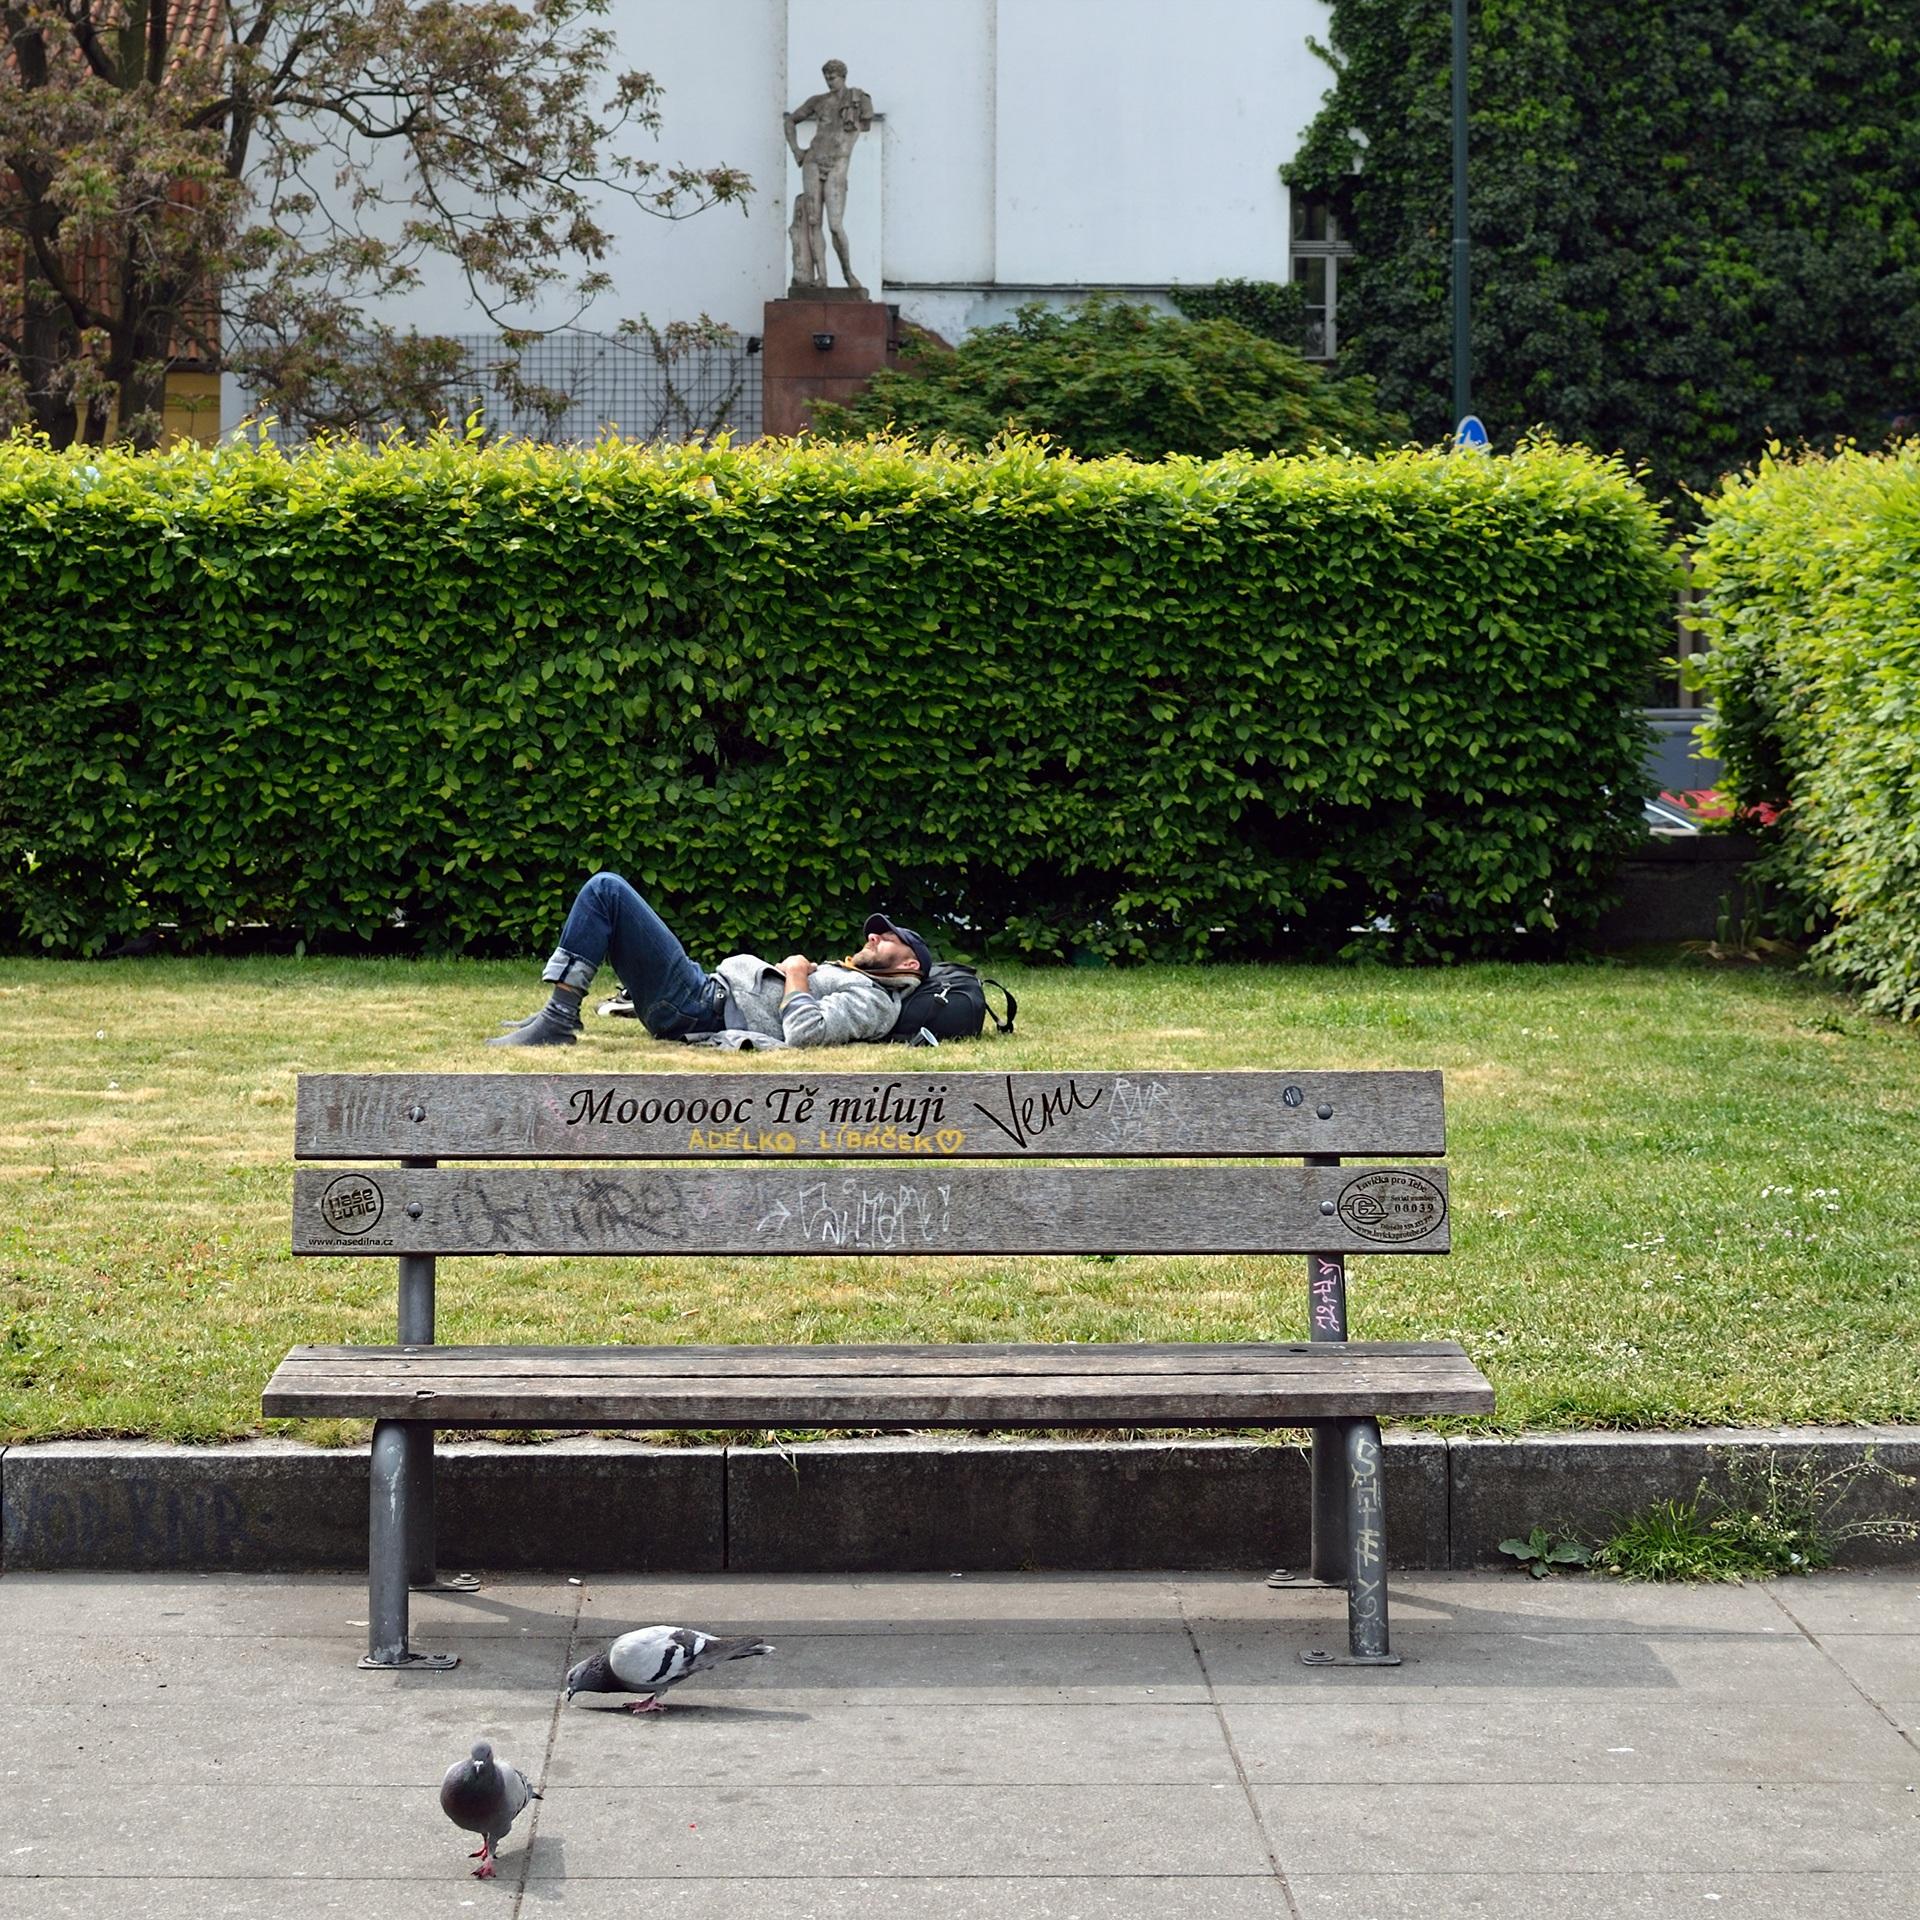 Fotos gratis : hombre, césped, banco, parque, mueble, jardín ...